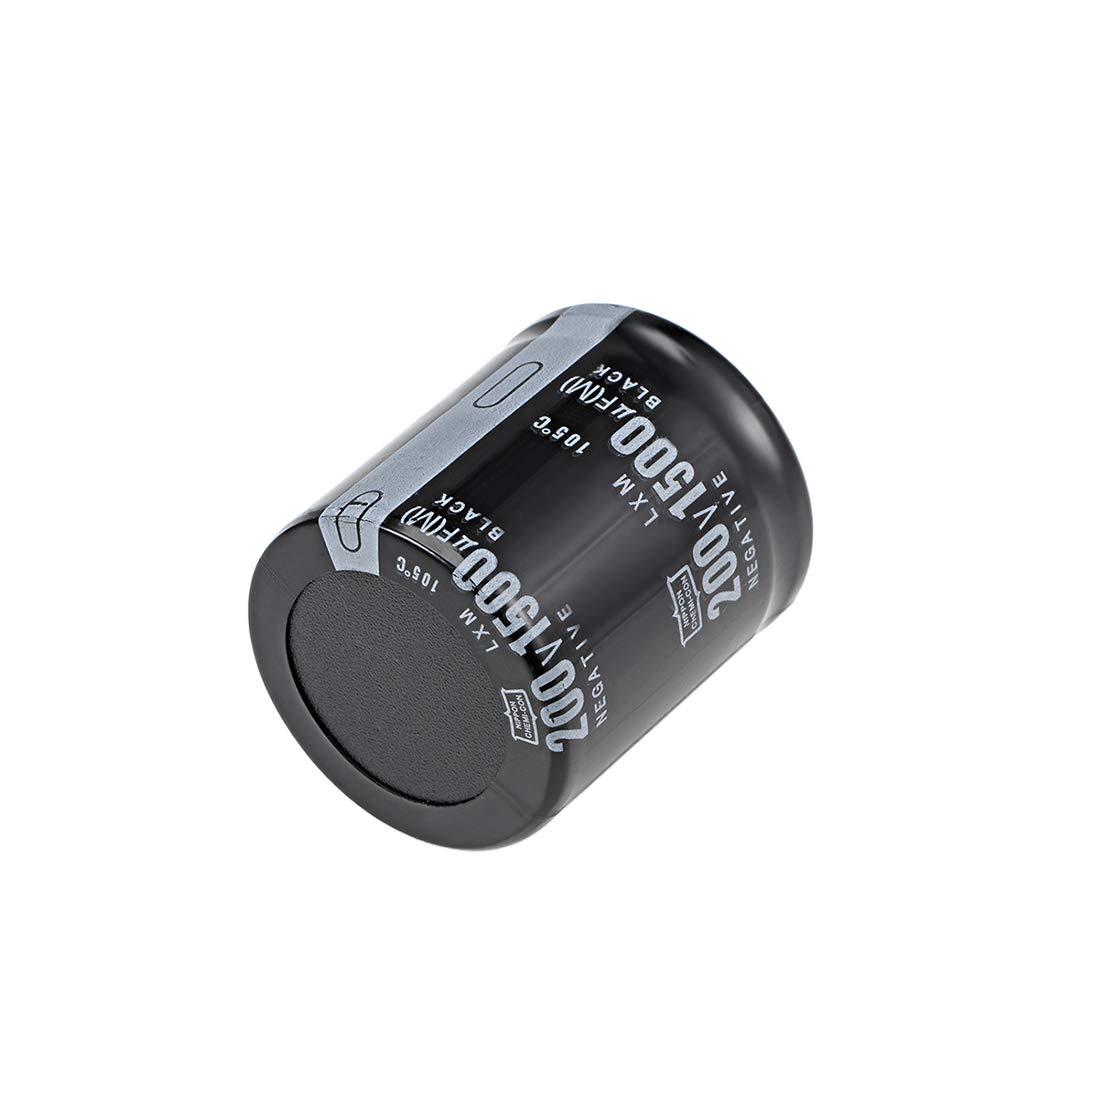 Aluminum Electrolytic Capacitors 105C High Temp 3pcs uxcell 1500uF 200V Capacitor